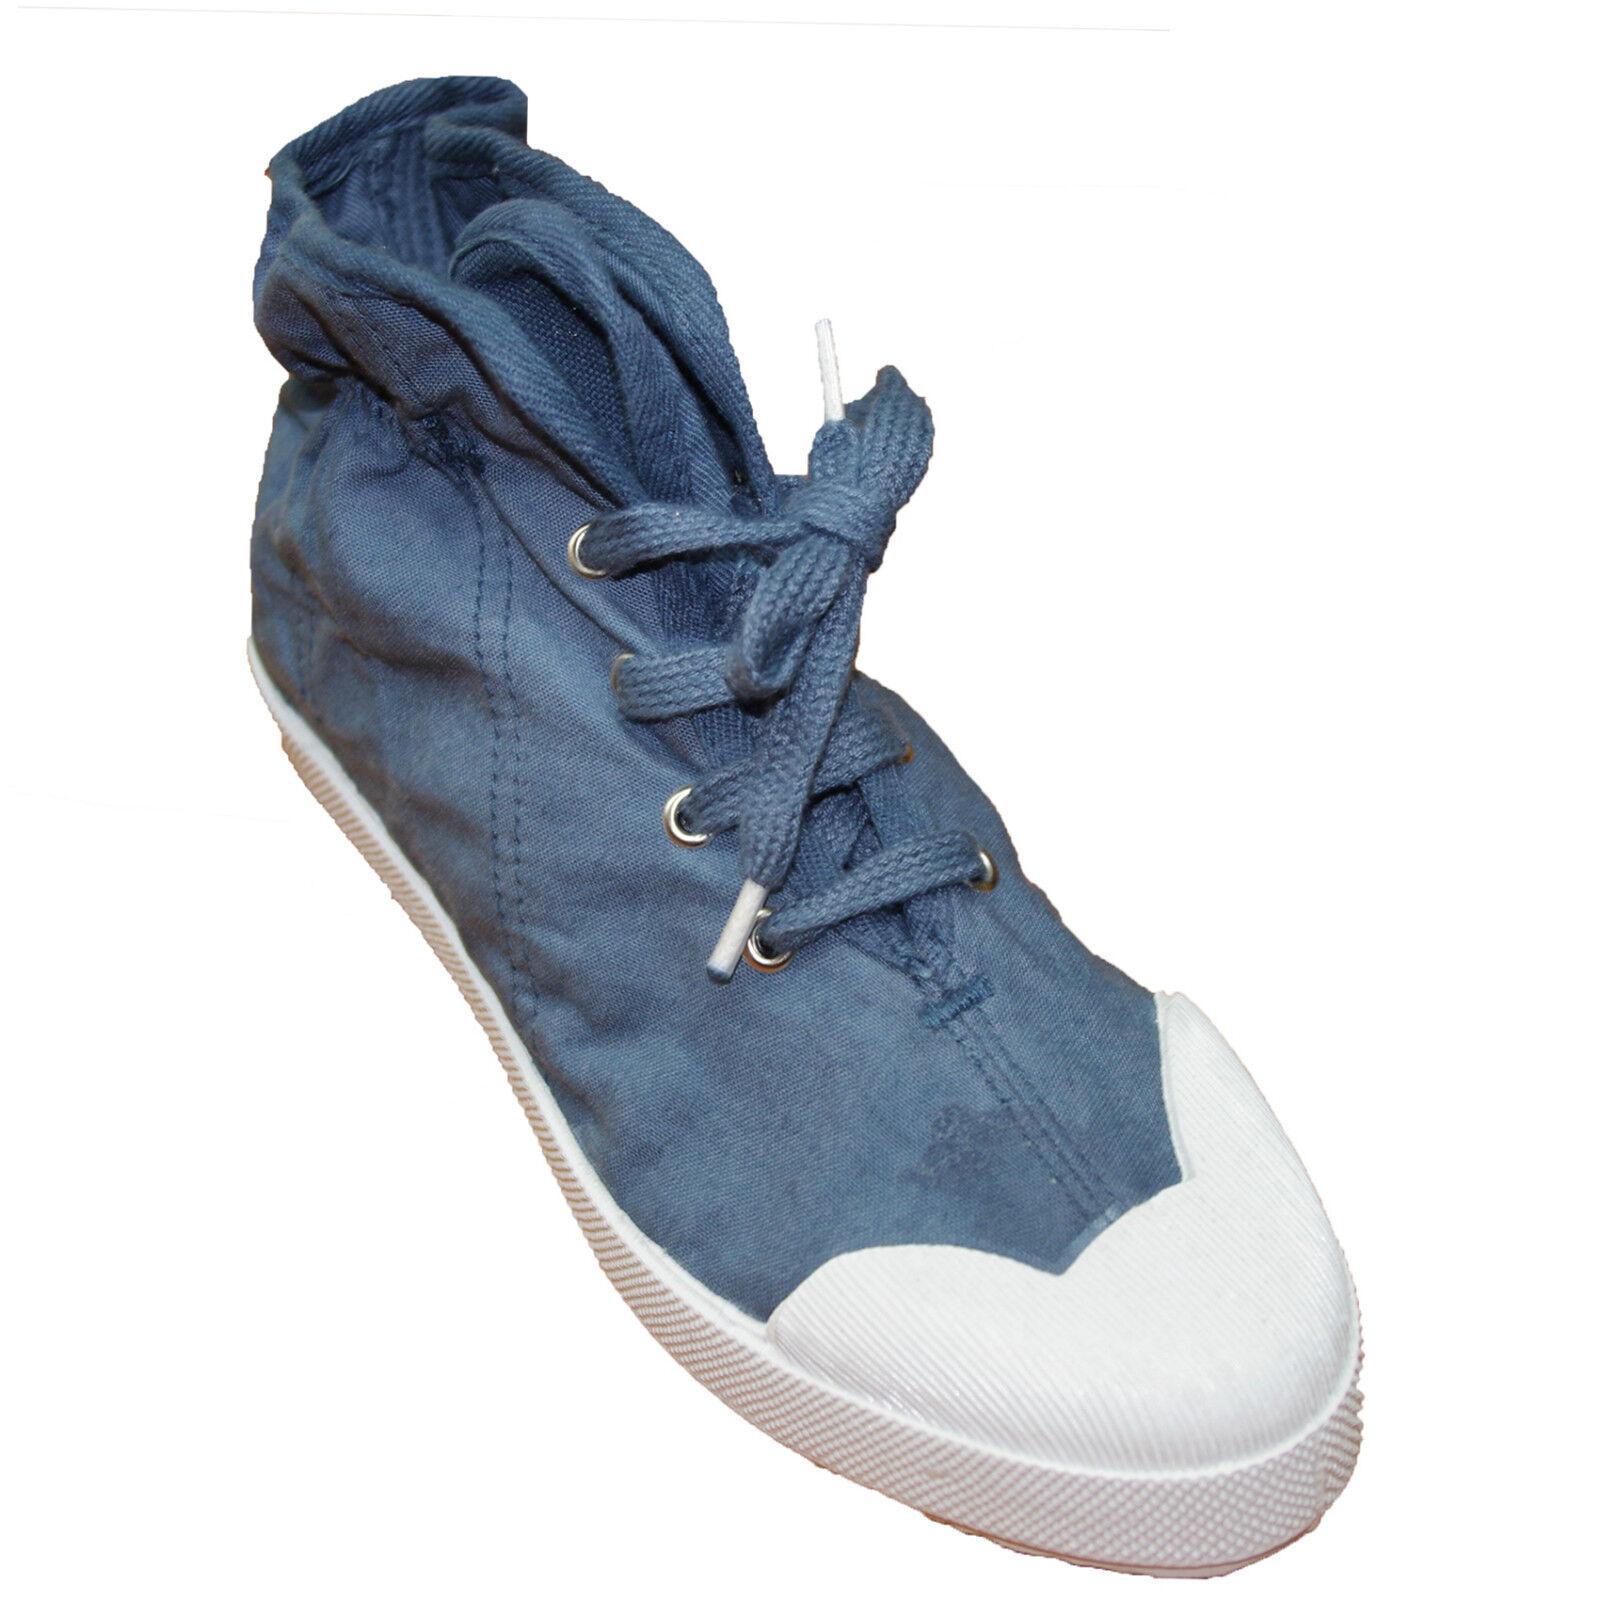 Baskets toile LA FEE MARABOUTEE femme bleu taille 35